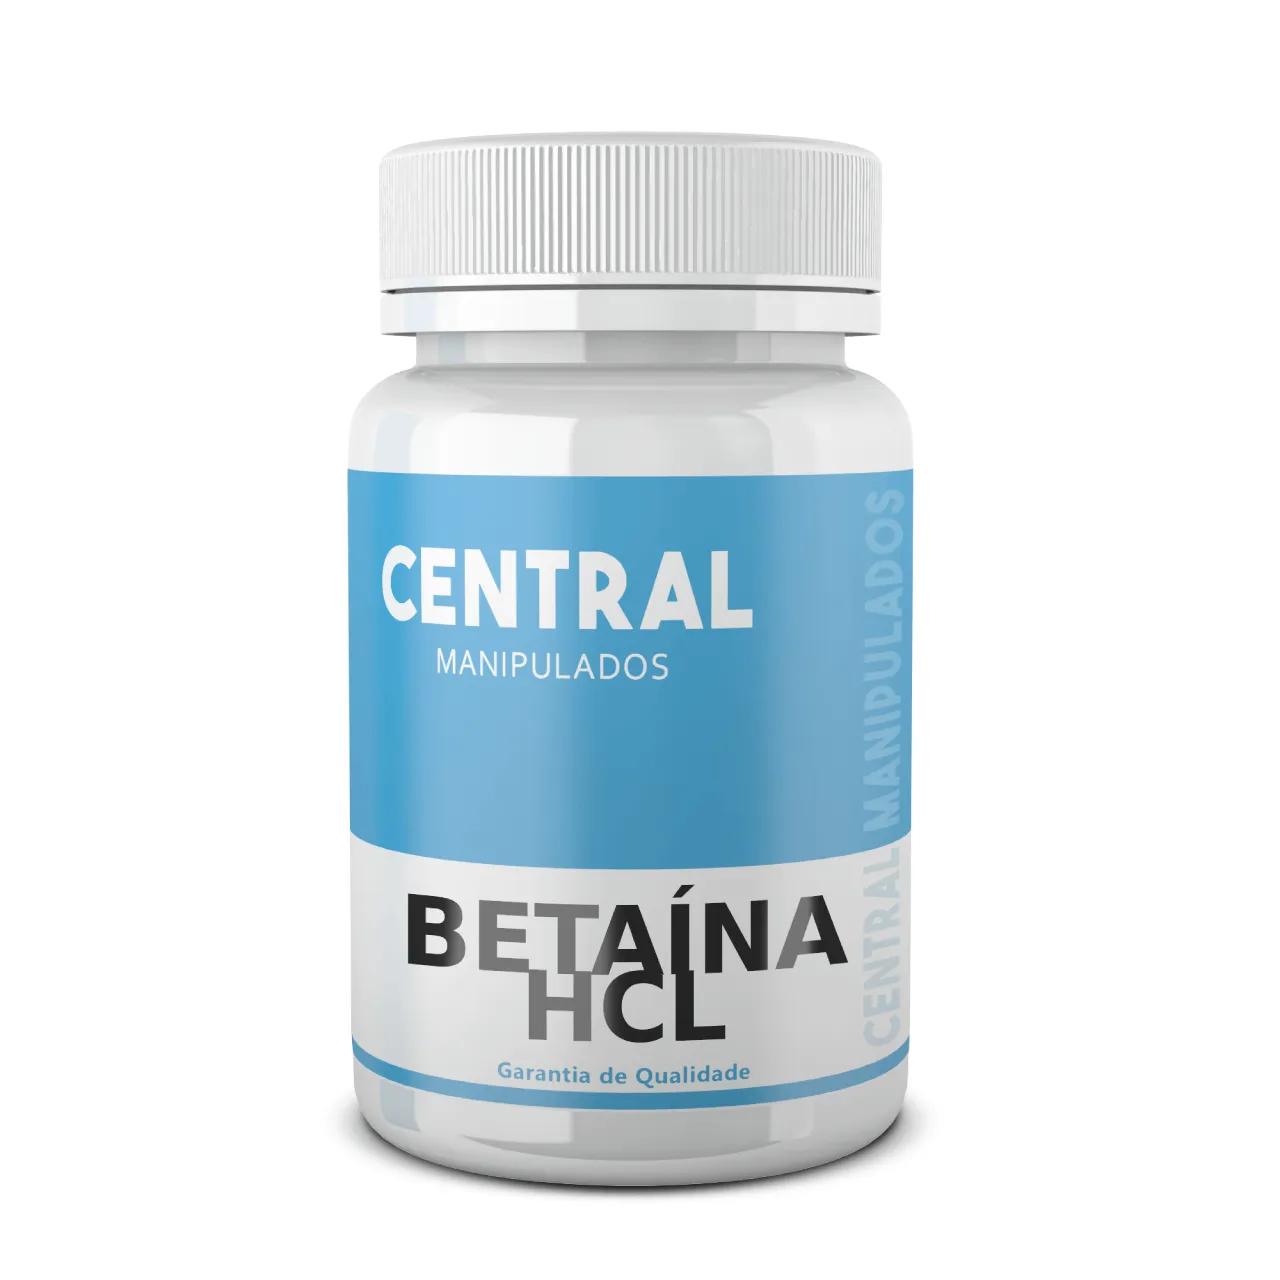 Betaína HCL 300mg - 120 cápsulas